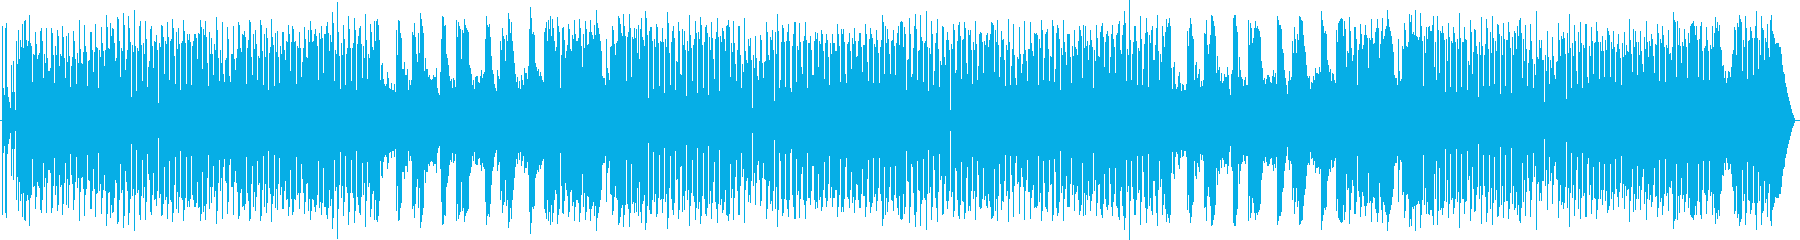 B3オルガンのタッチで素晴らしいリ...の再生済みの波形